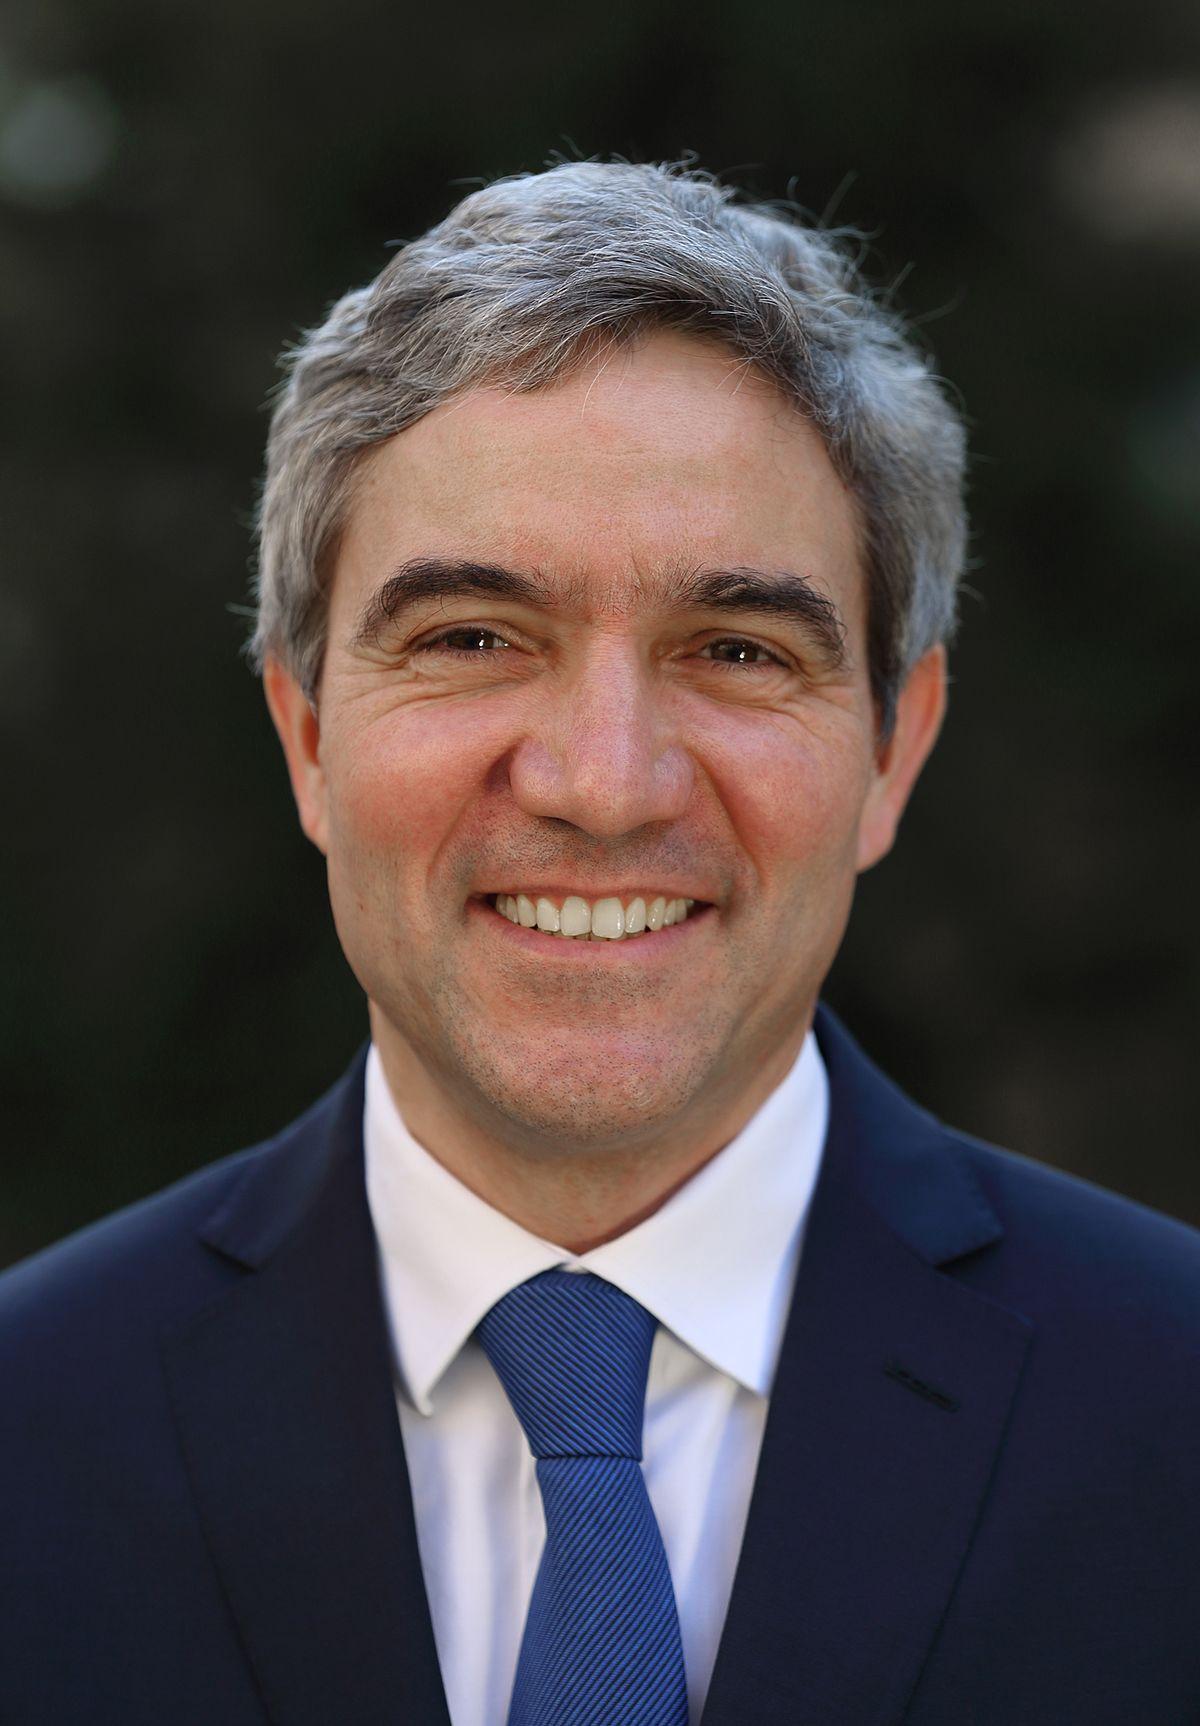 Stephan Harbarth Wikipedia